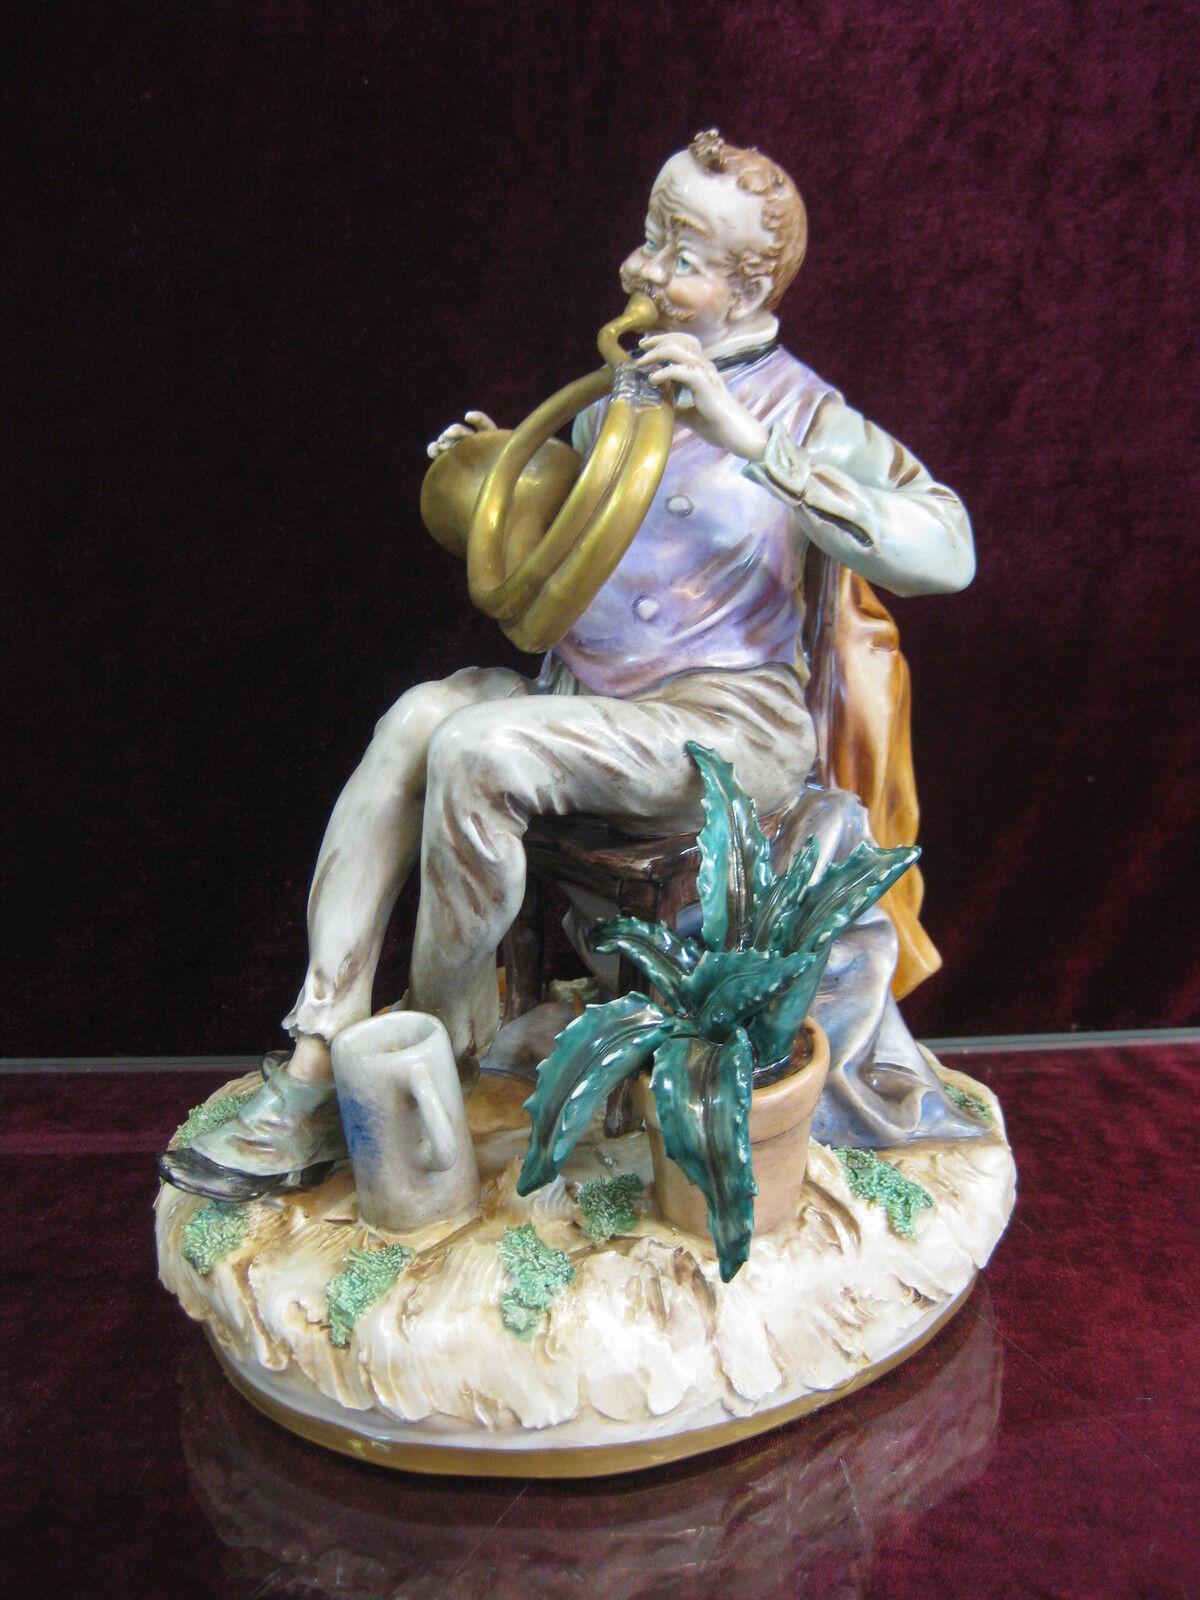 Scheibe Alsbach Figur  Heinz Schober Tuba Musik Horn Trompete Porzellan